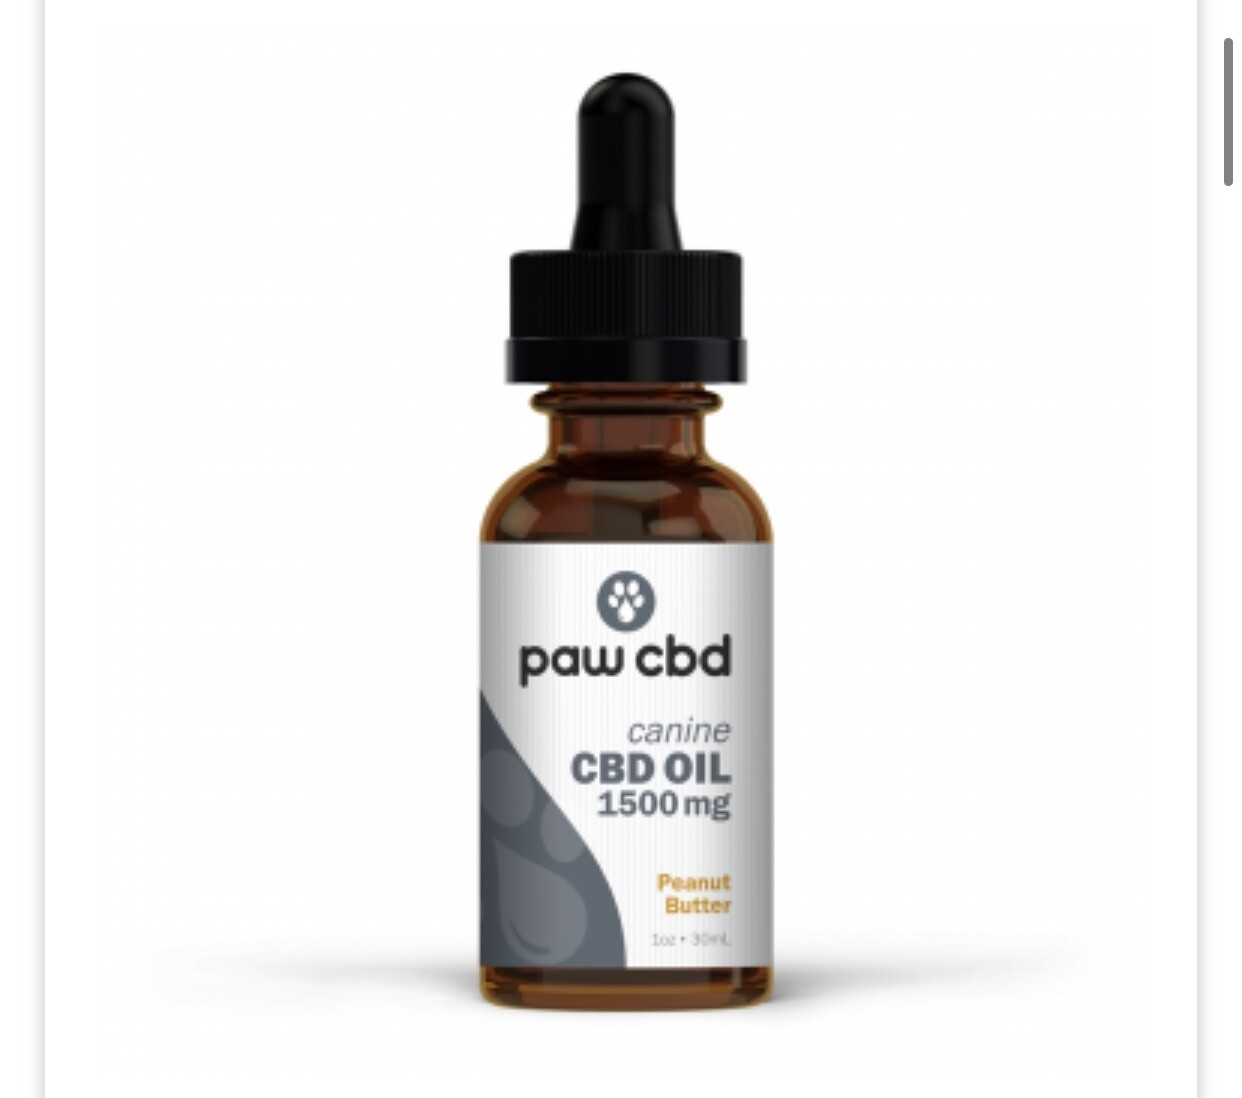 Paw CBD 1500 mg oil